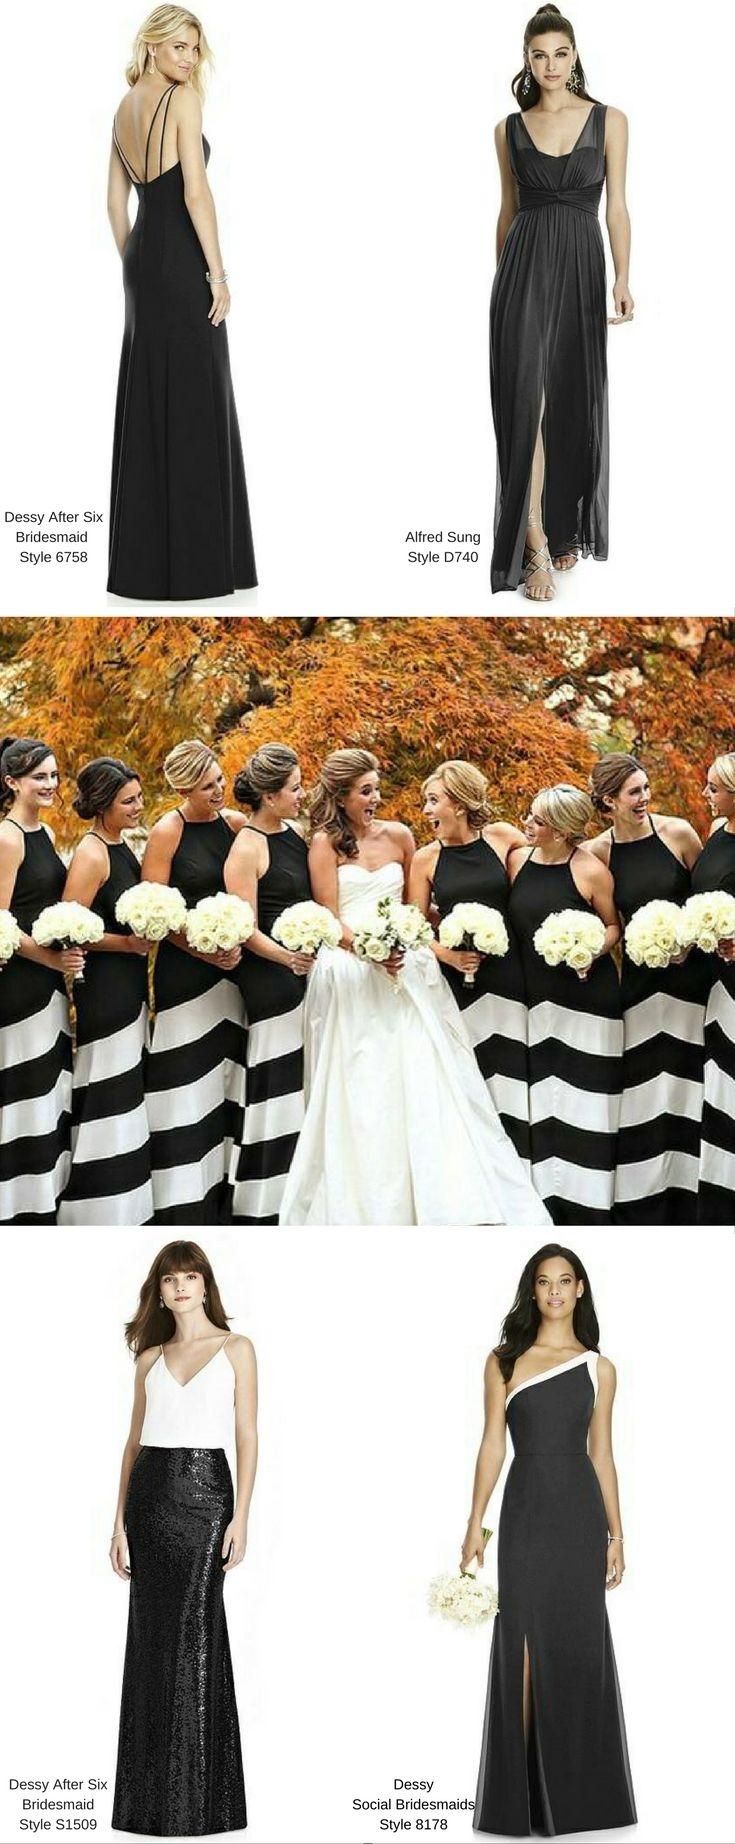 347 best BLACK BRIDESMAID DRESSES + WEDDINGS images on Pinterest ...